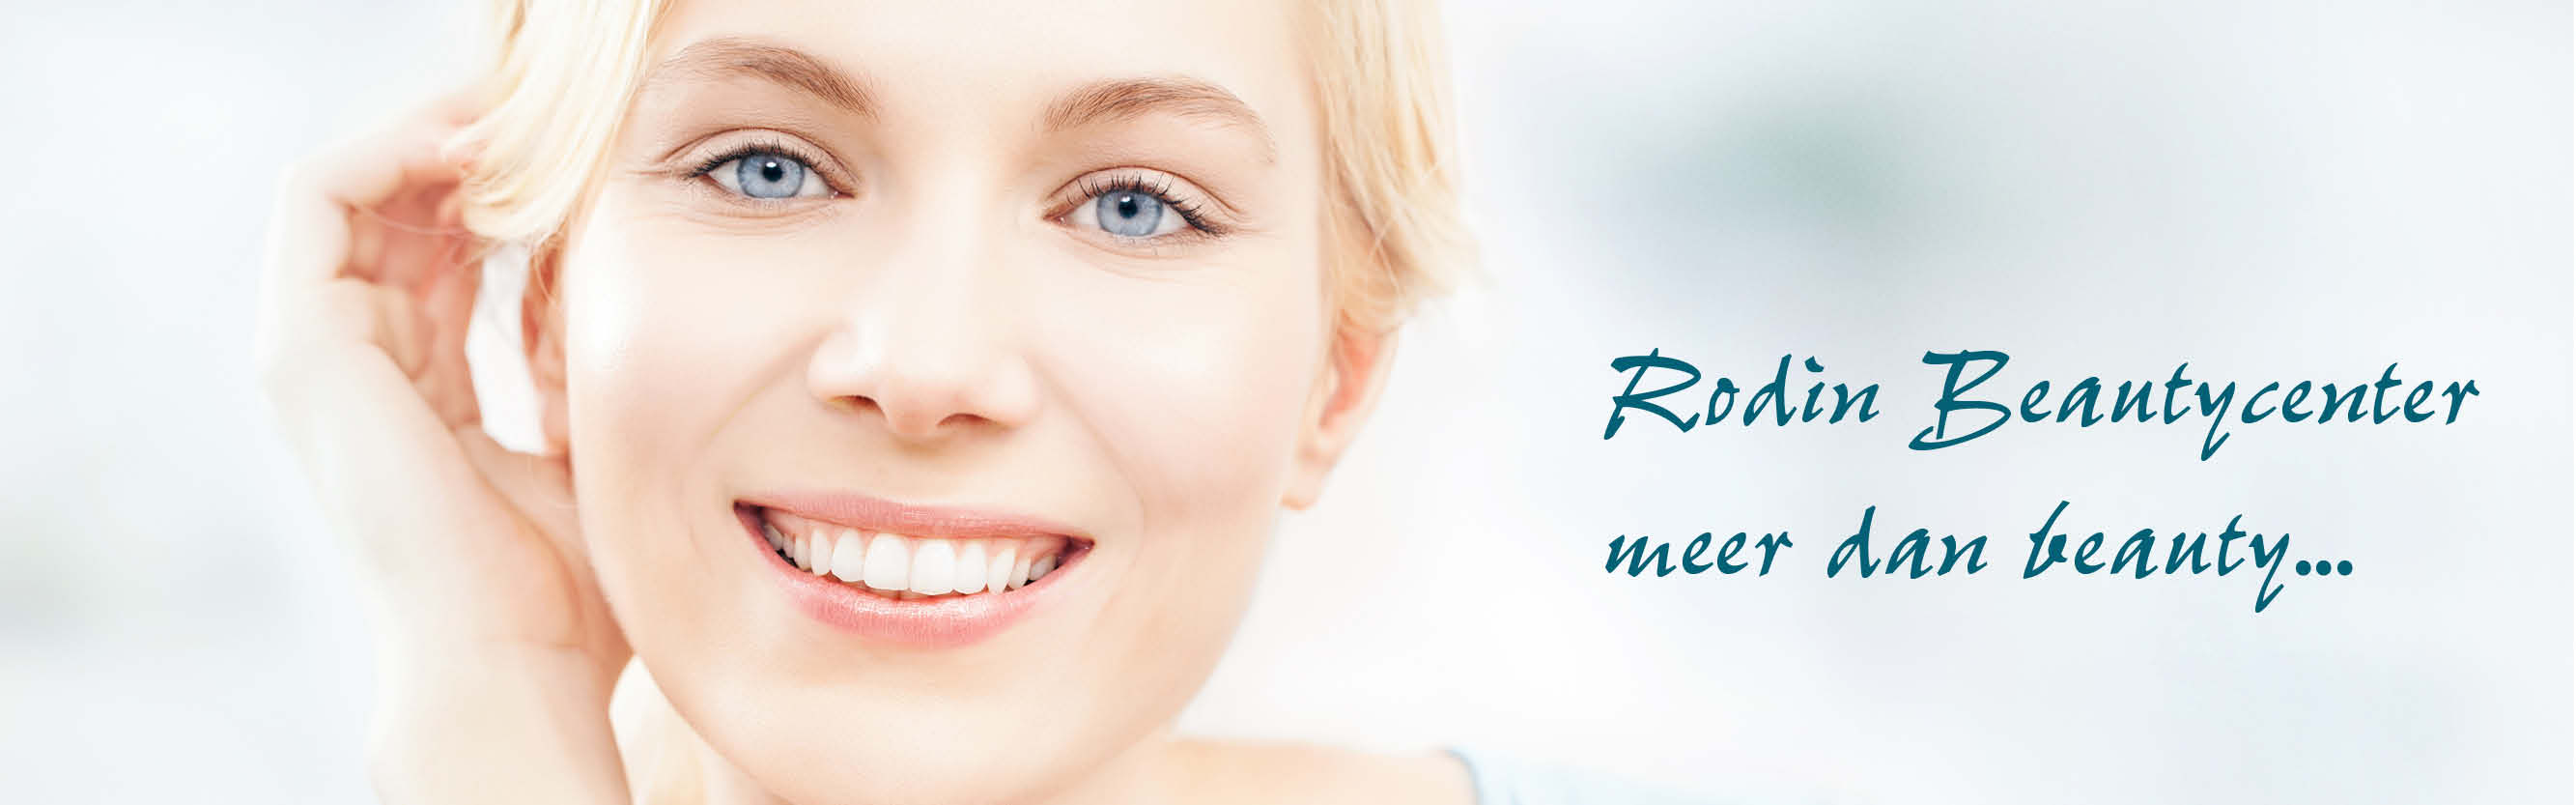 Rodin Beautycenter gezichtsbehandeling Wilp